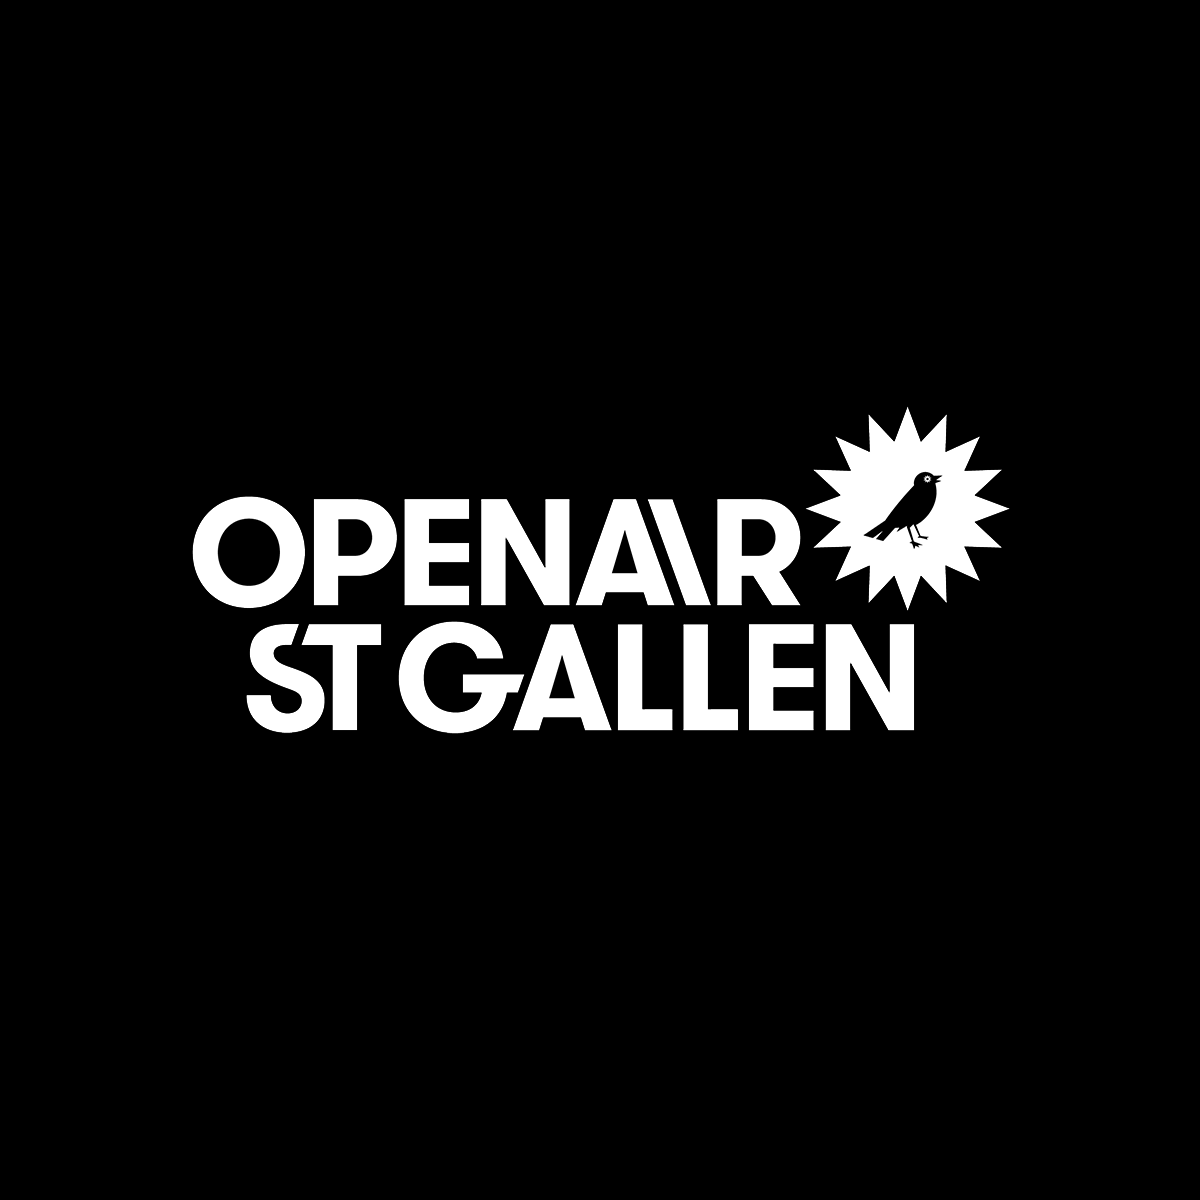 (c) Openairsg.ch